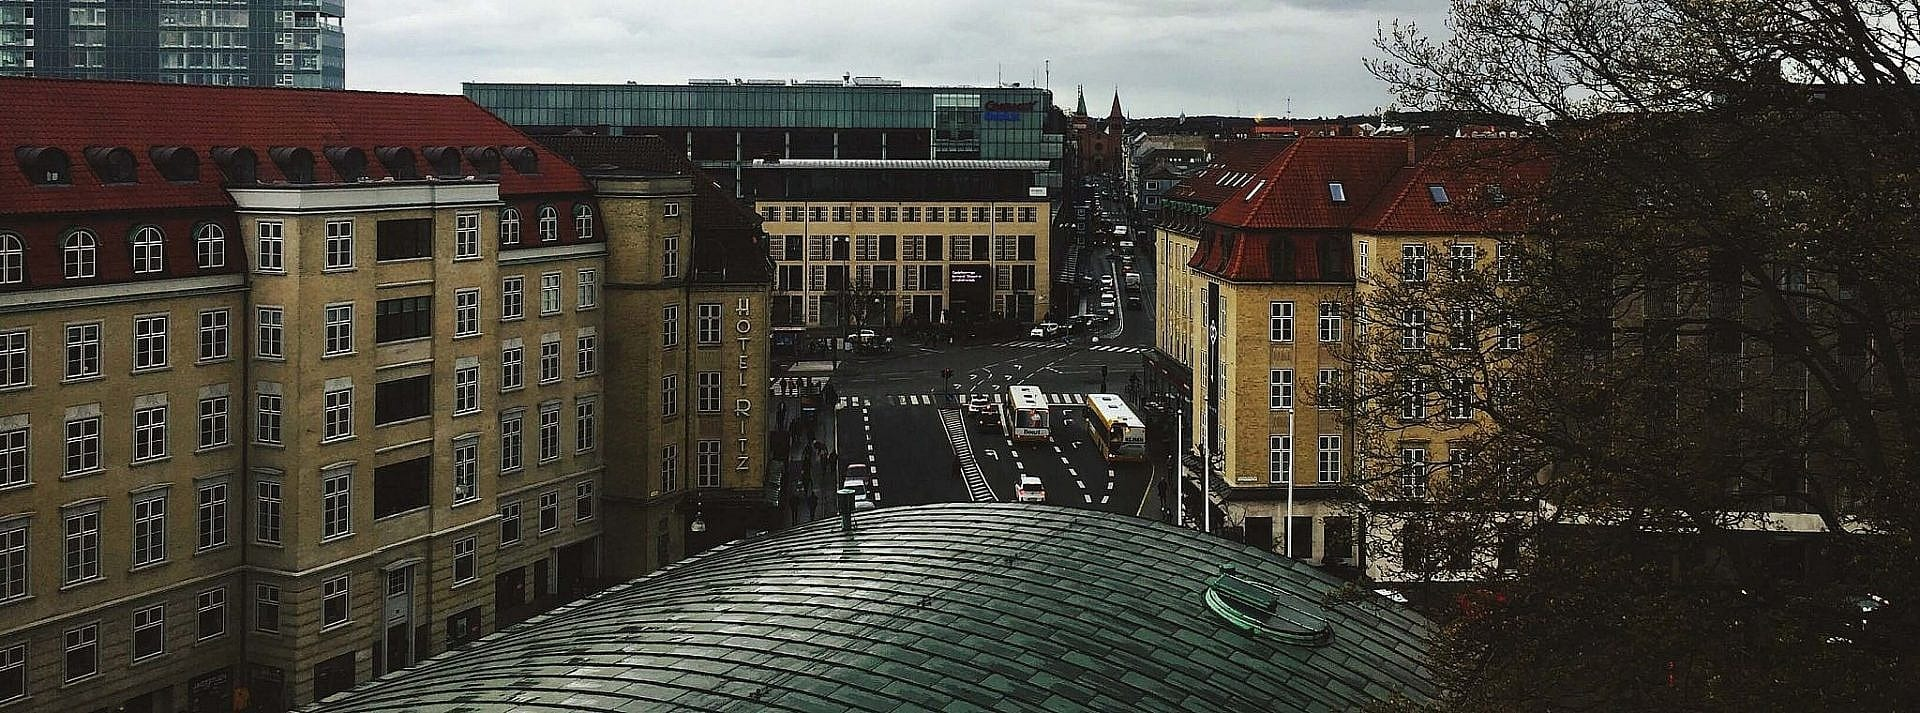 Offentlige bygninger i Nordjylland, Hanstholm, Thy, Klitmøller og Thisted